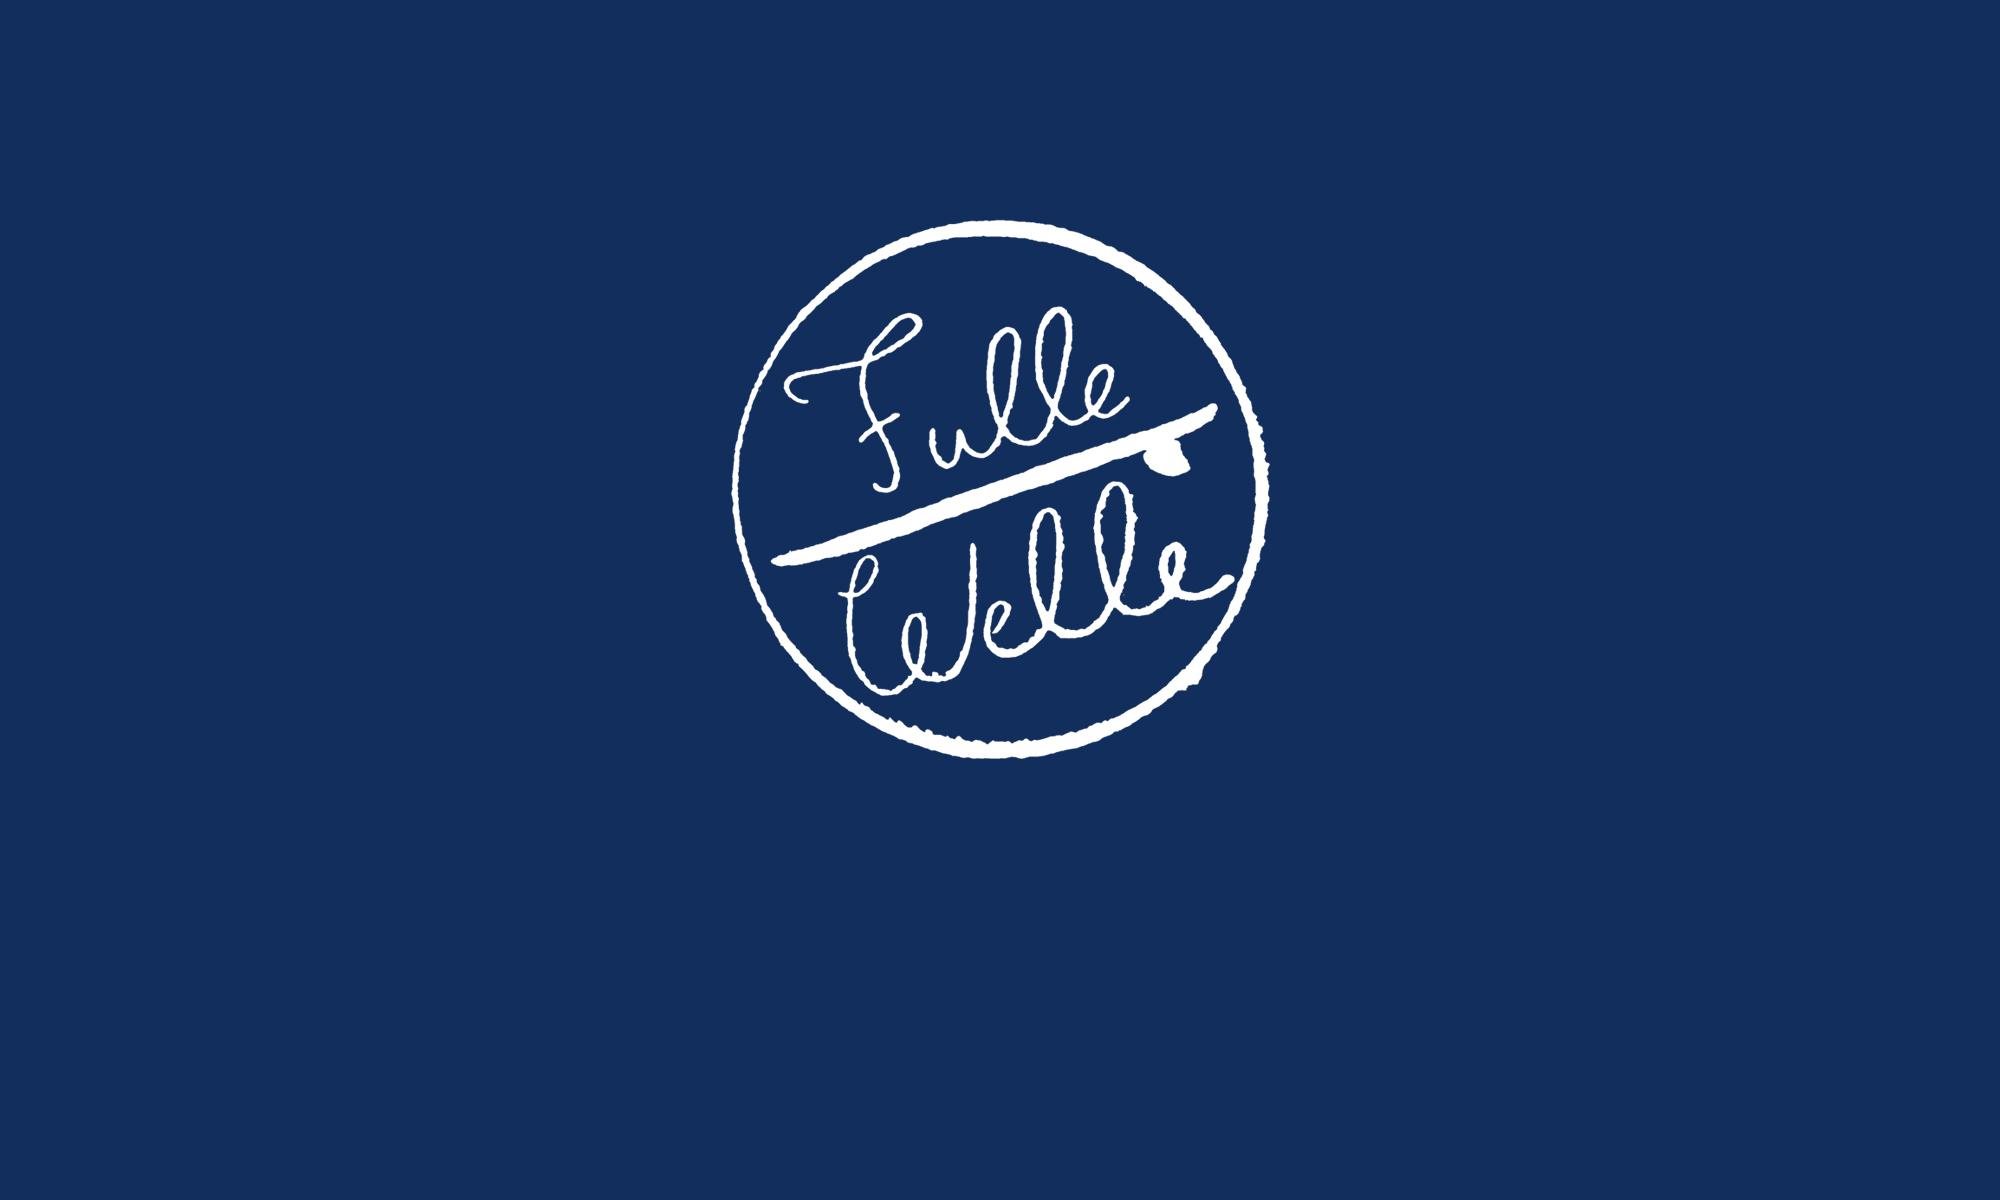 Fulle Welle